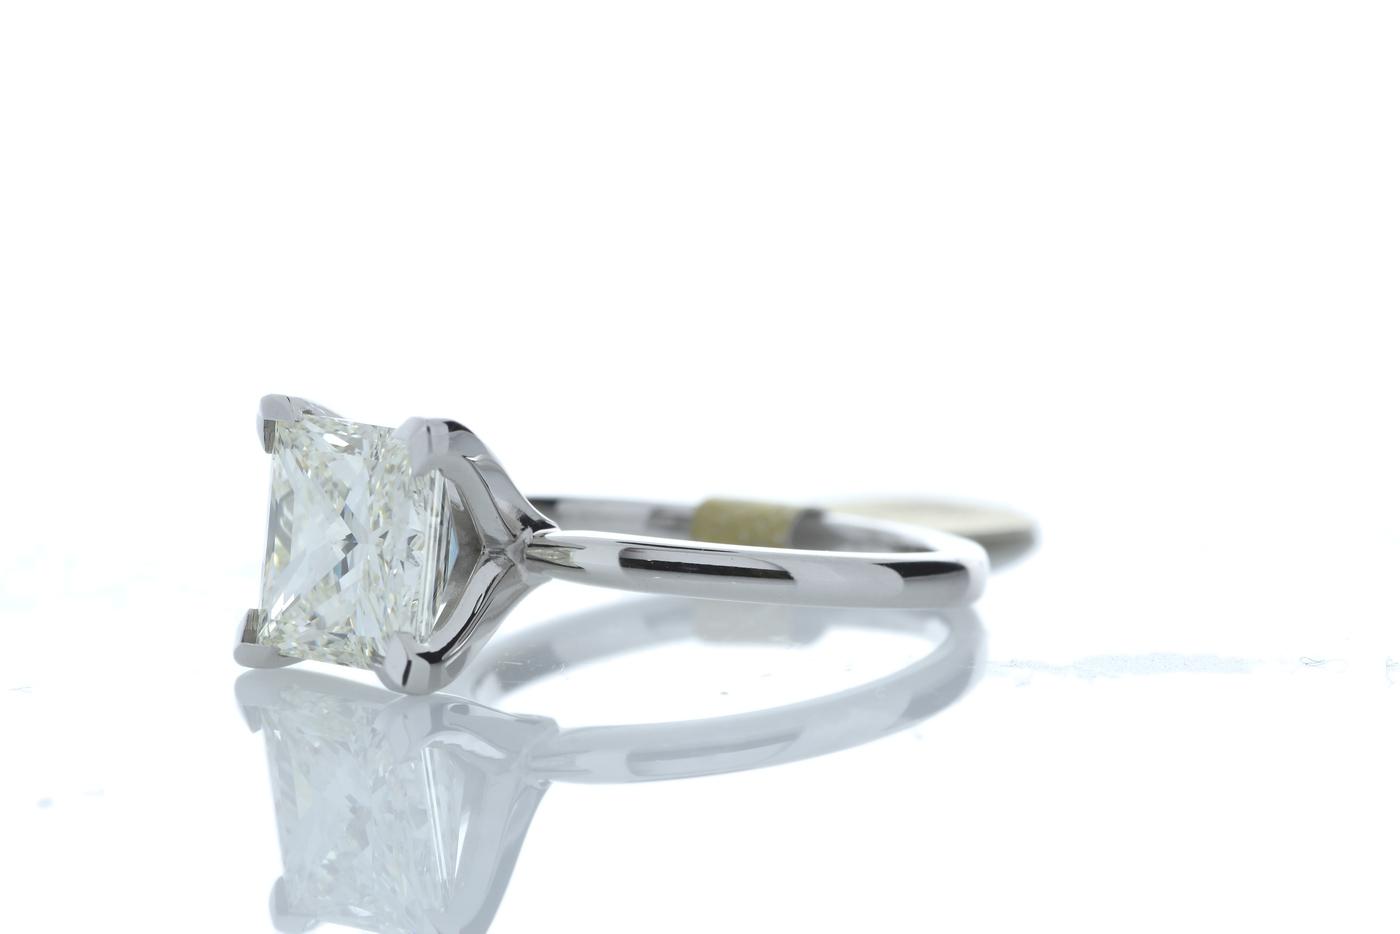 18ct White Gold Princess Cut Diamond Ring 3.09 Carats - Image 2 of 4